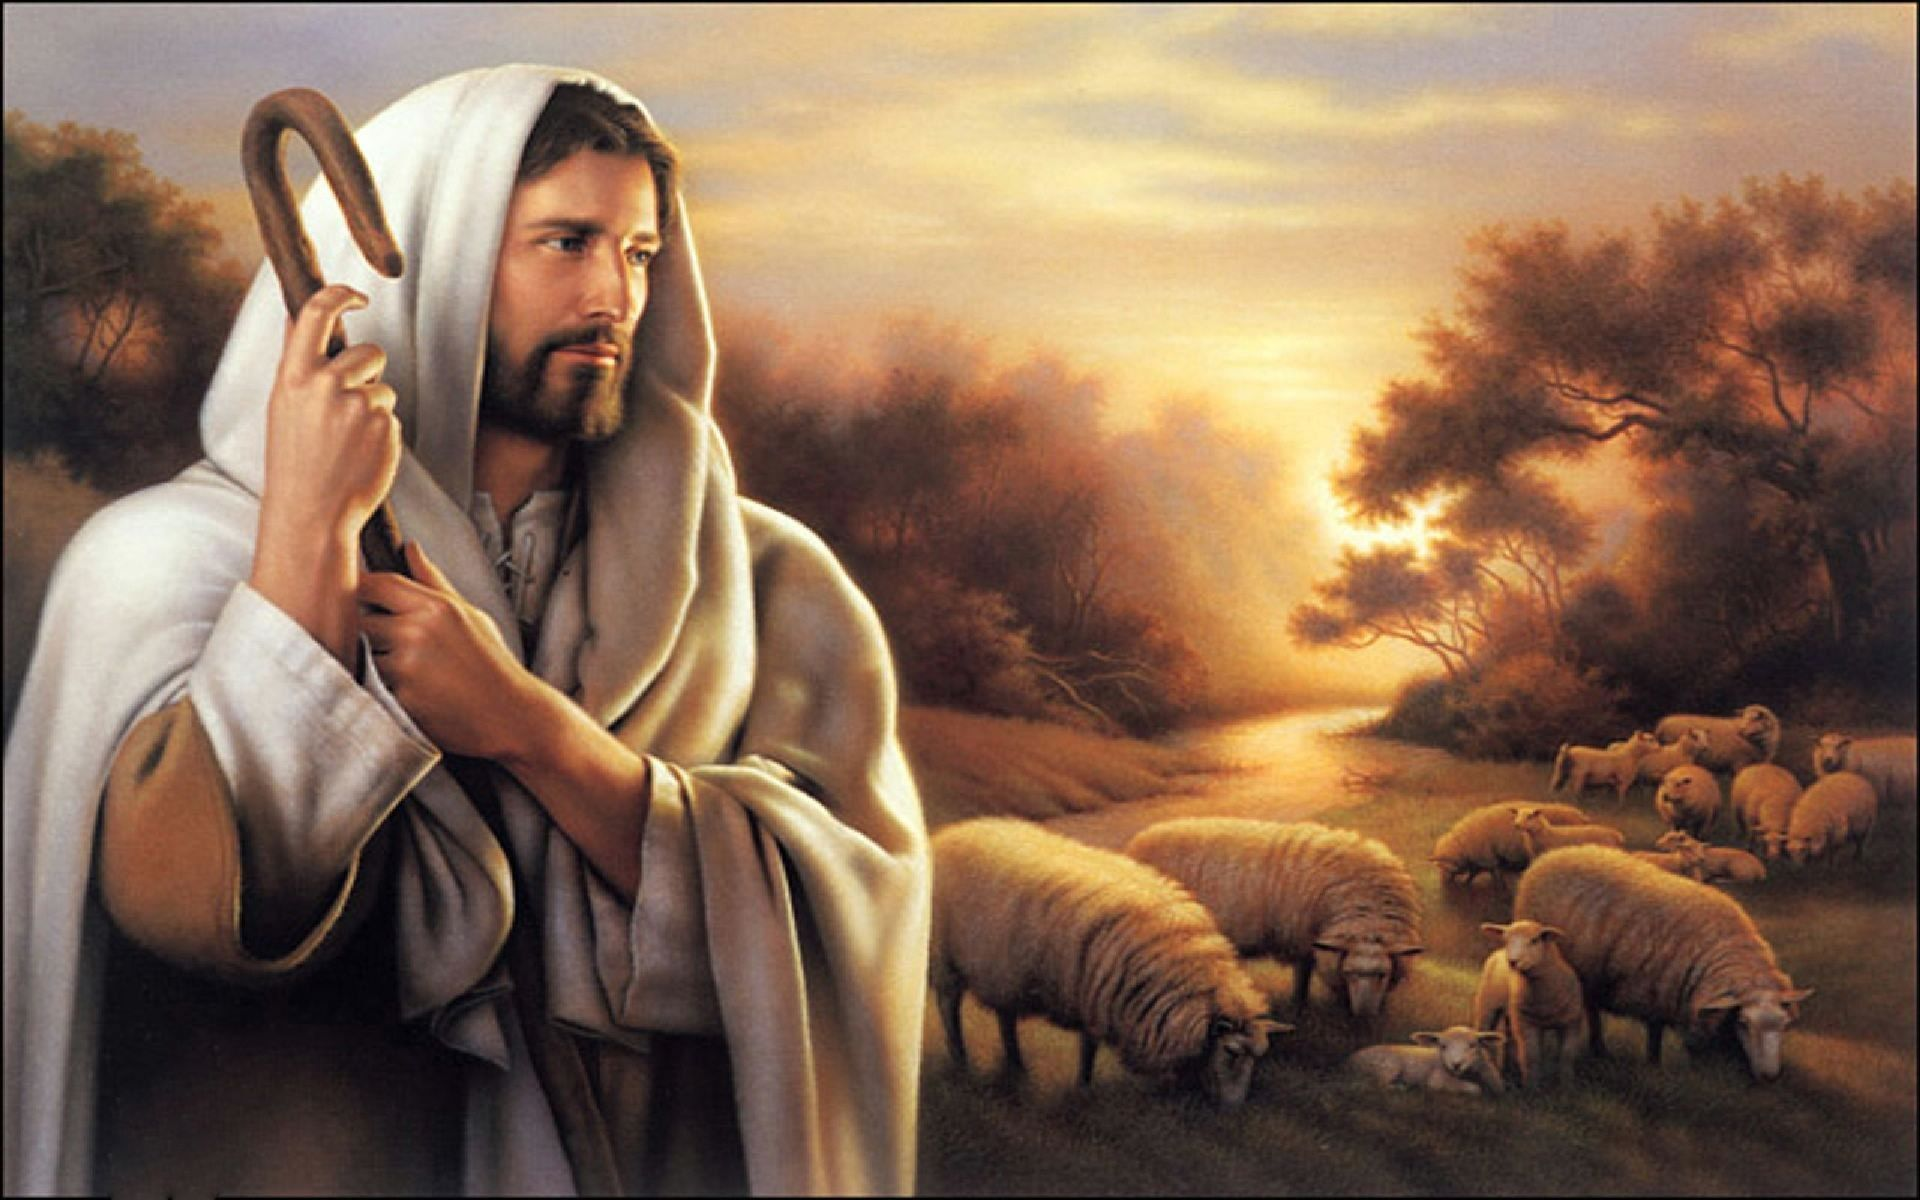 Quadro Decorativo Religioso Parede Jesus Cristo O Bom Pastor